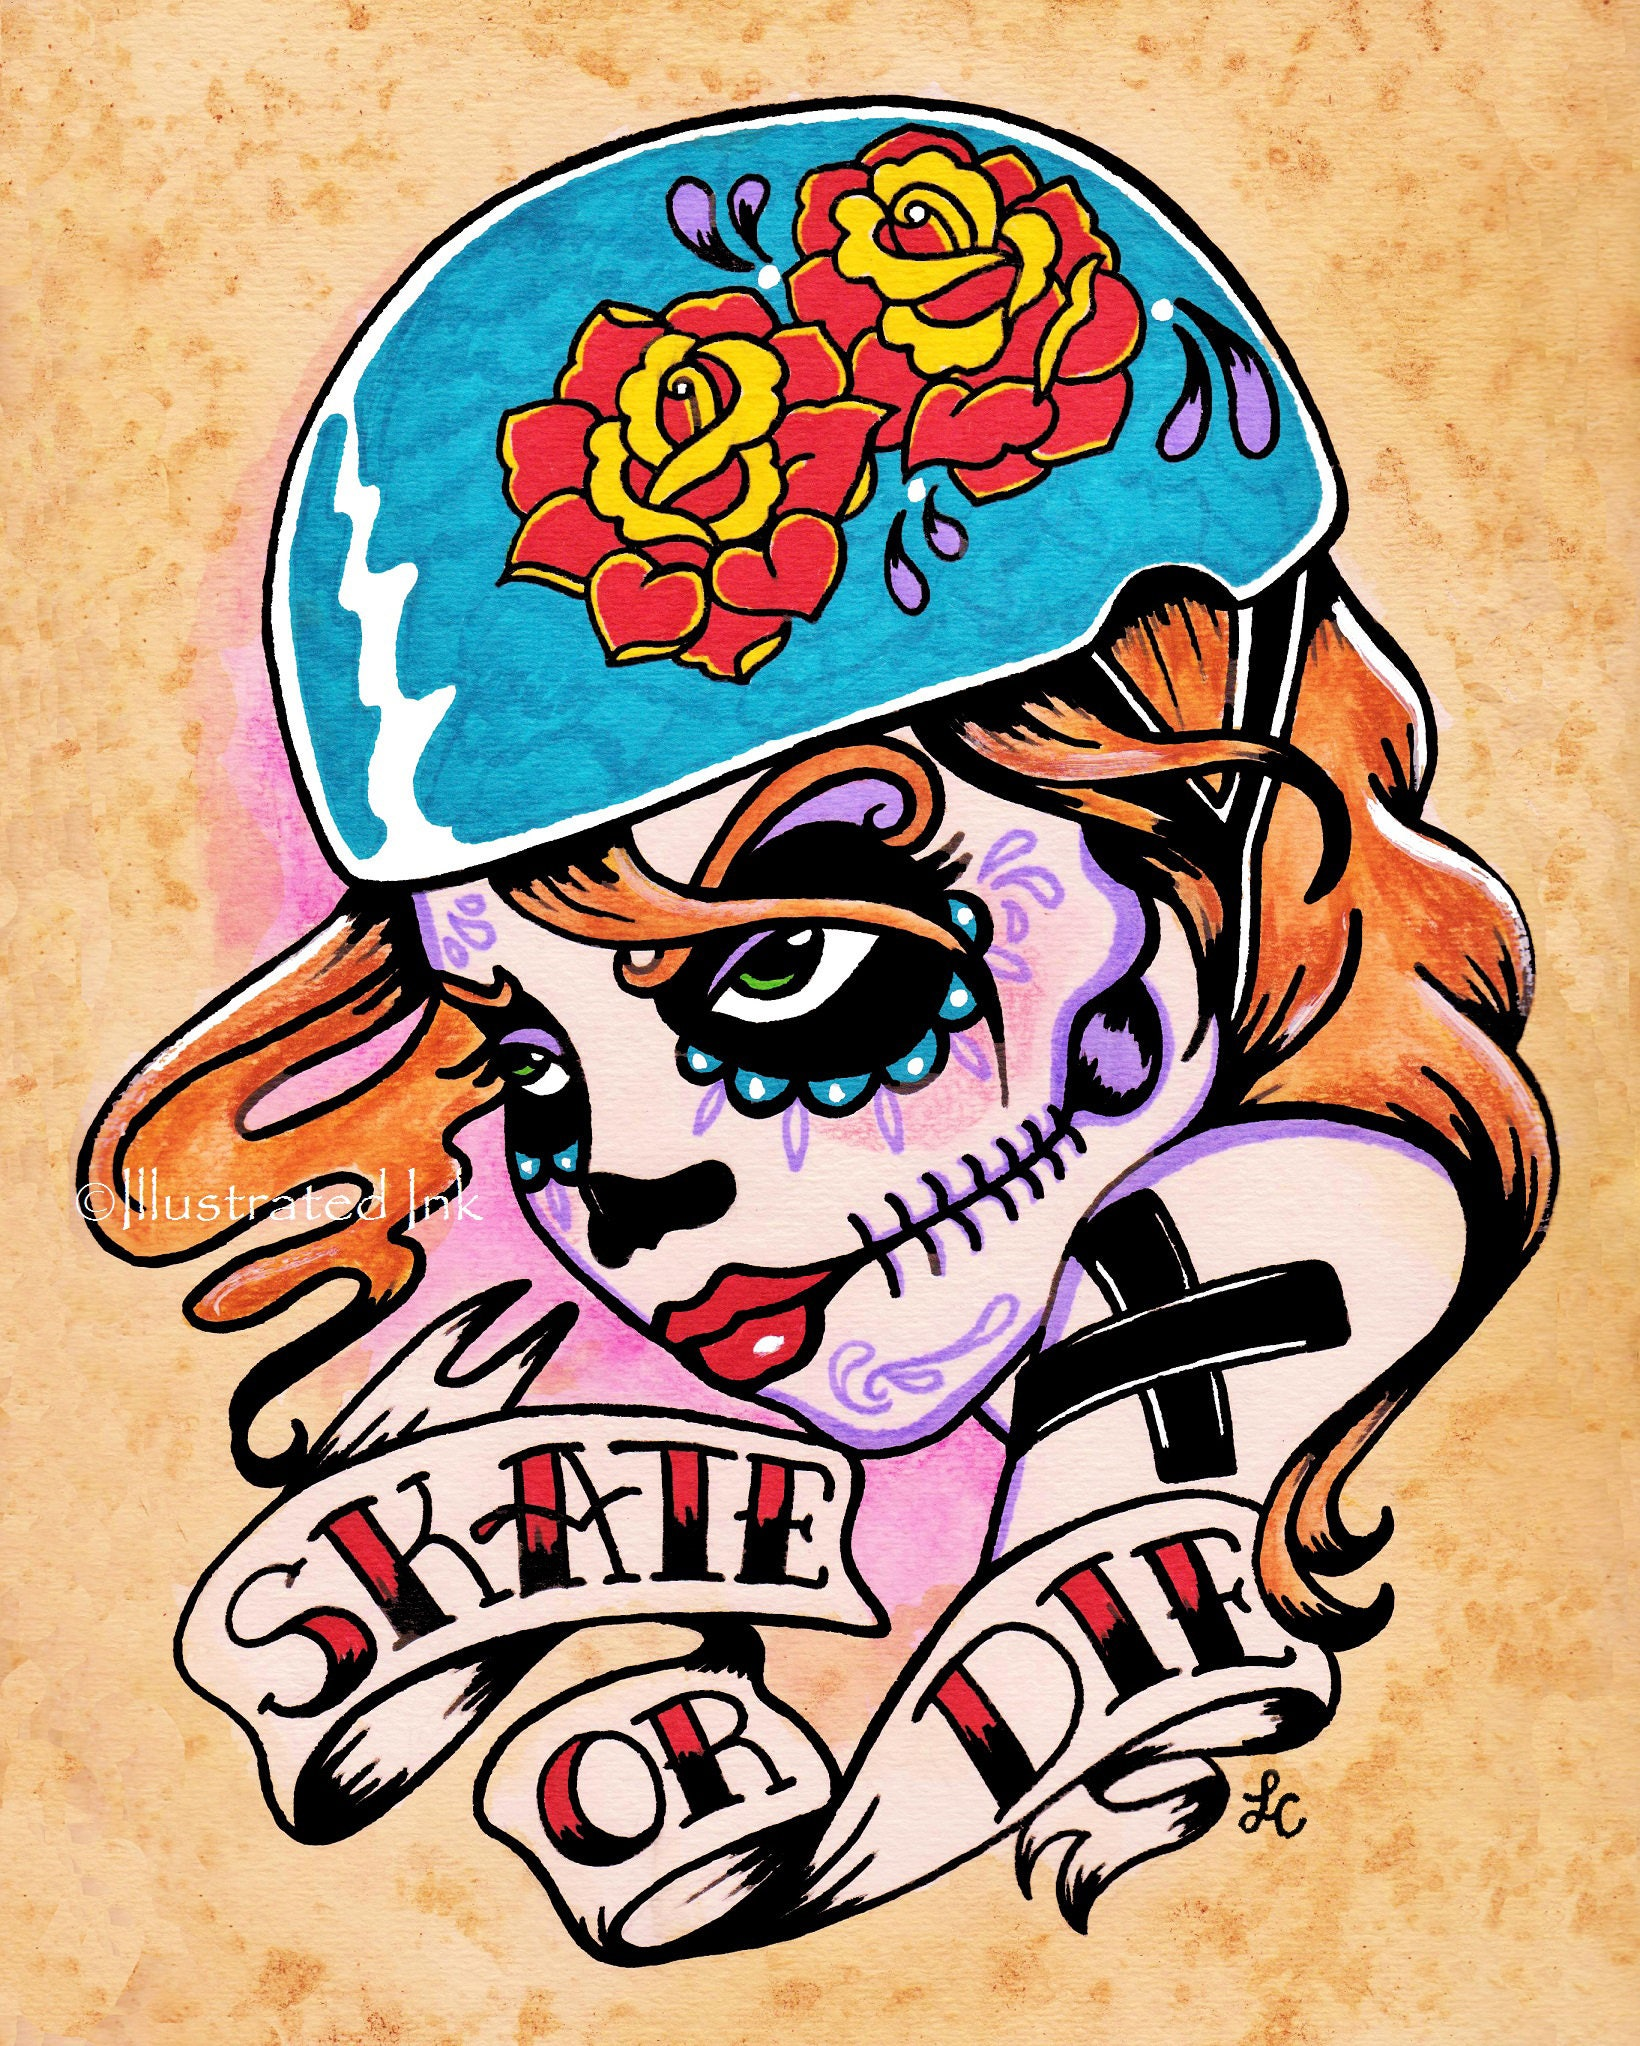 roller derby art day of the dead art roller girl tattoo. Black Bedroom Furniture Sets. Home Design Ideas